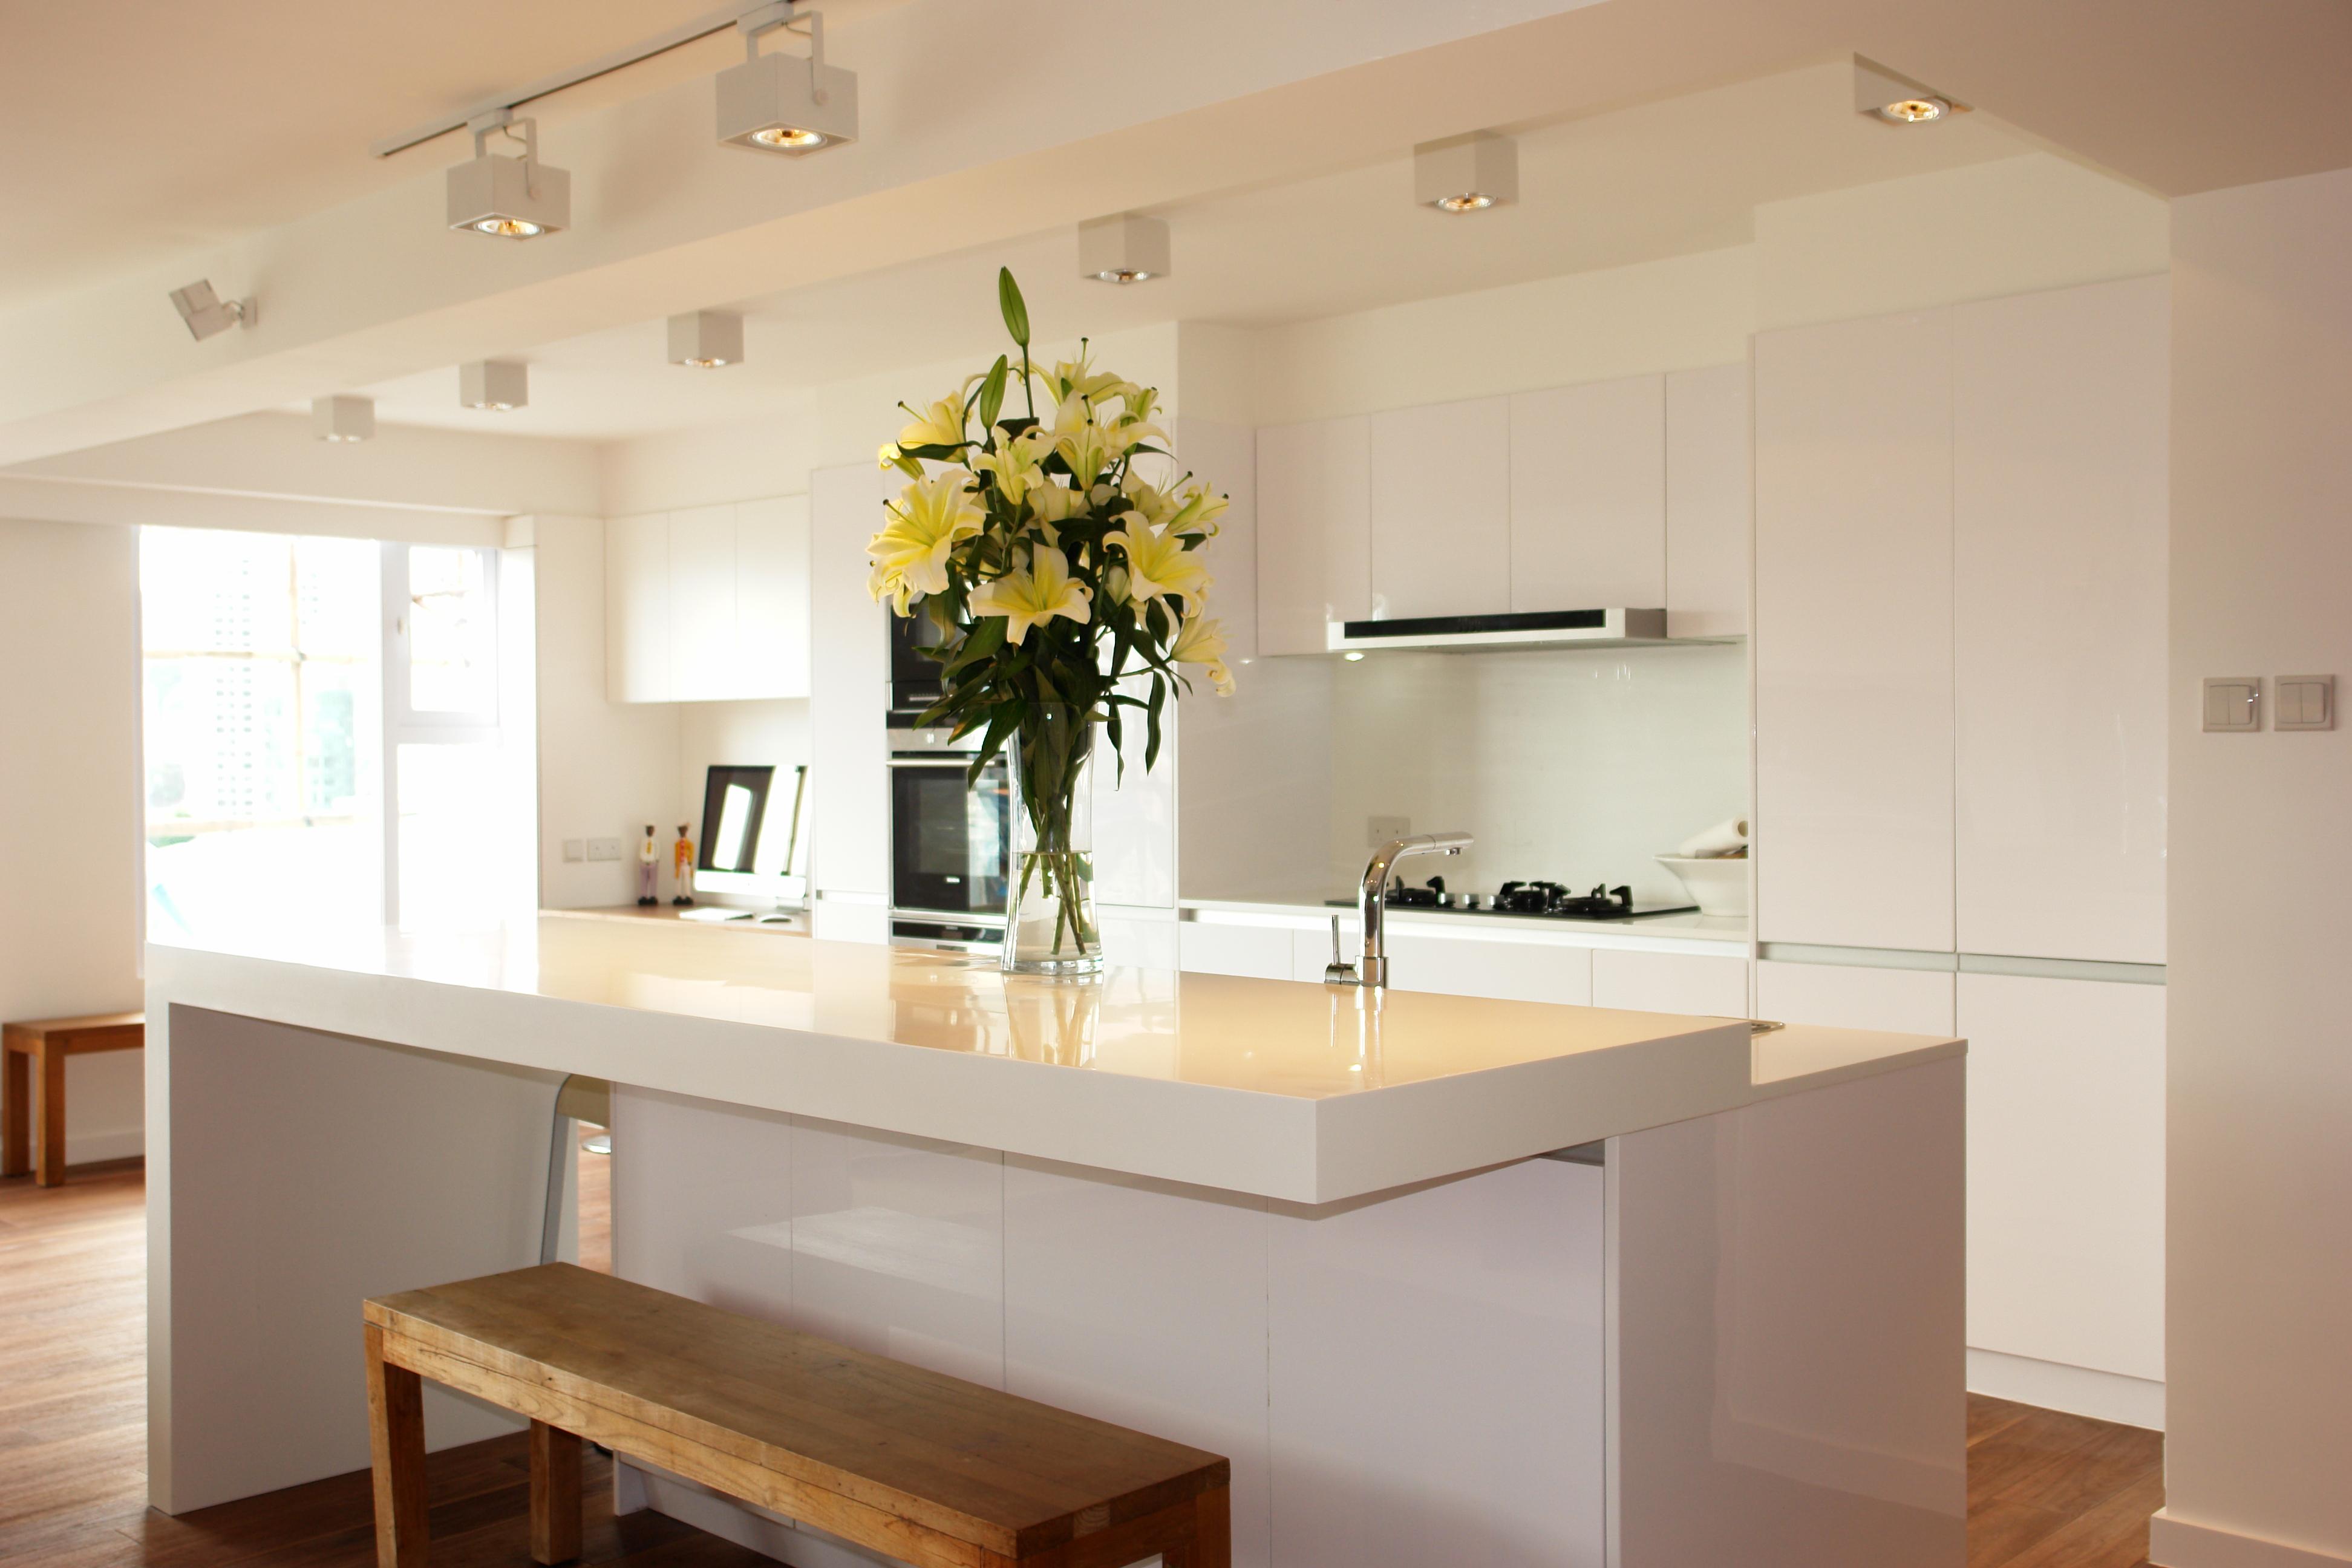 家居設計 Home Design hk 甜美的澳大利亞 Home Sweet Home Australia (15)